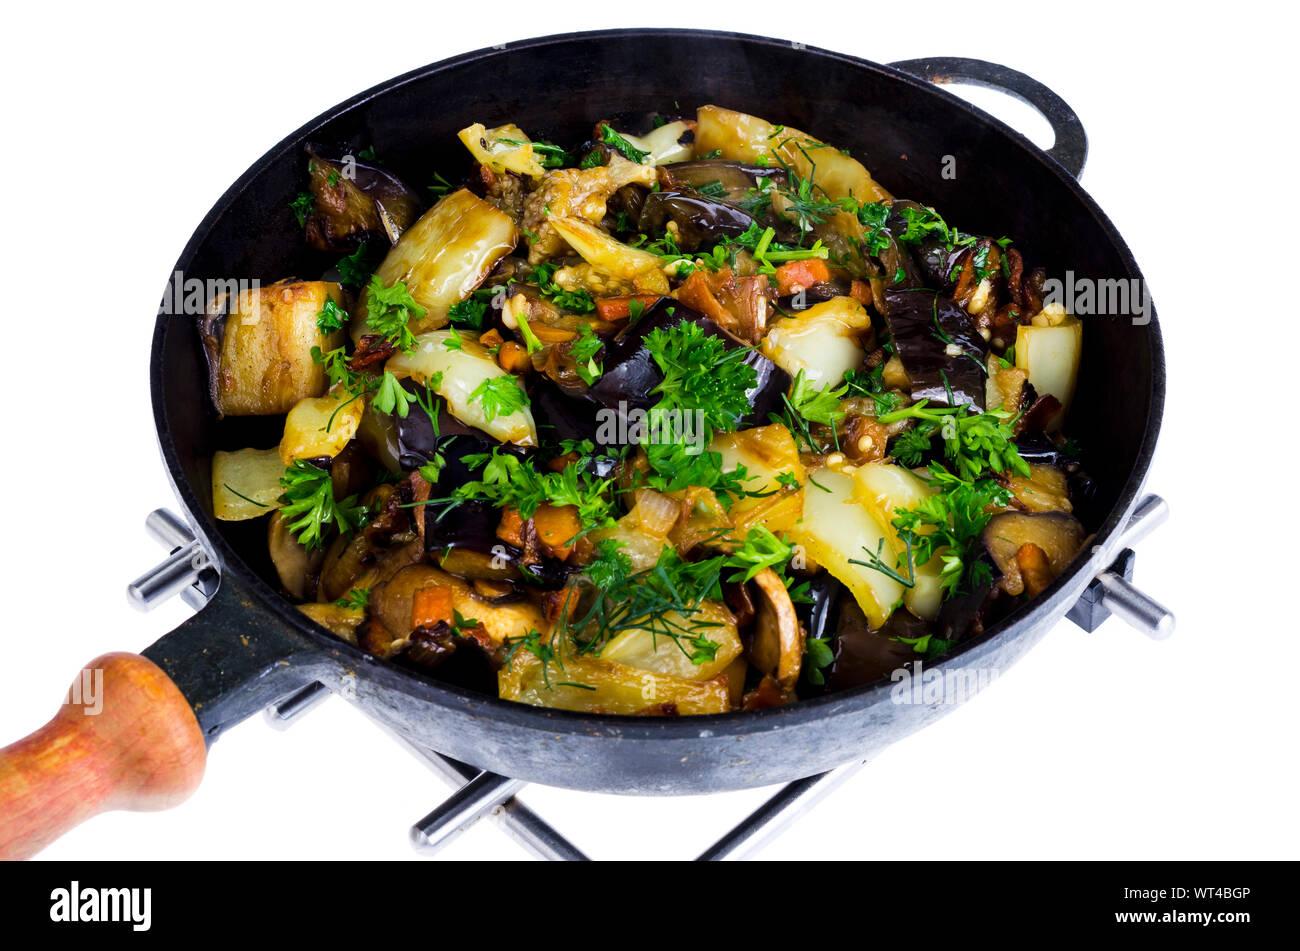 Vegetable stew pan saute isolated on white background. Studio Photo Stock Photo